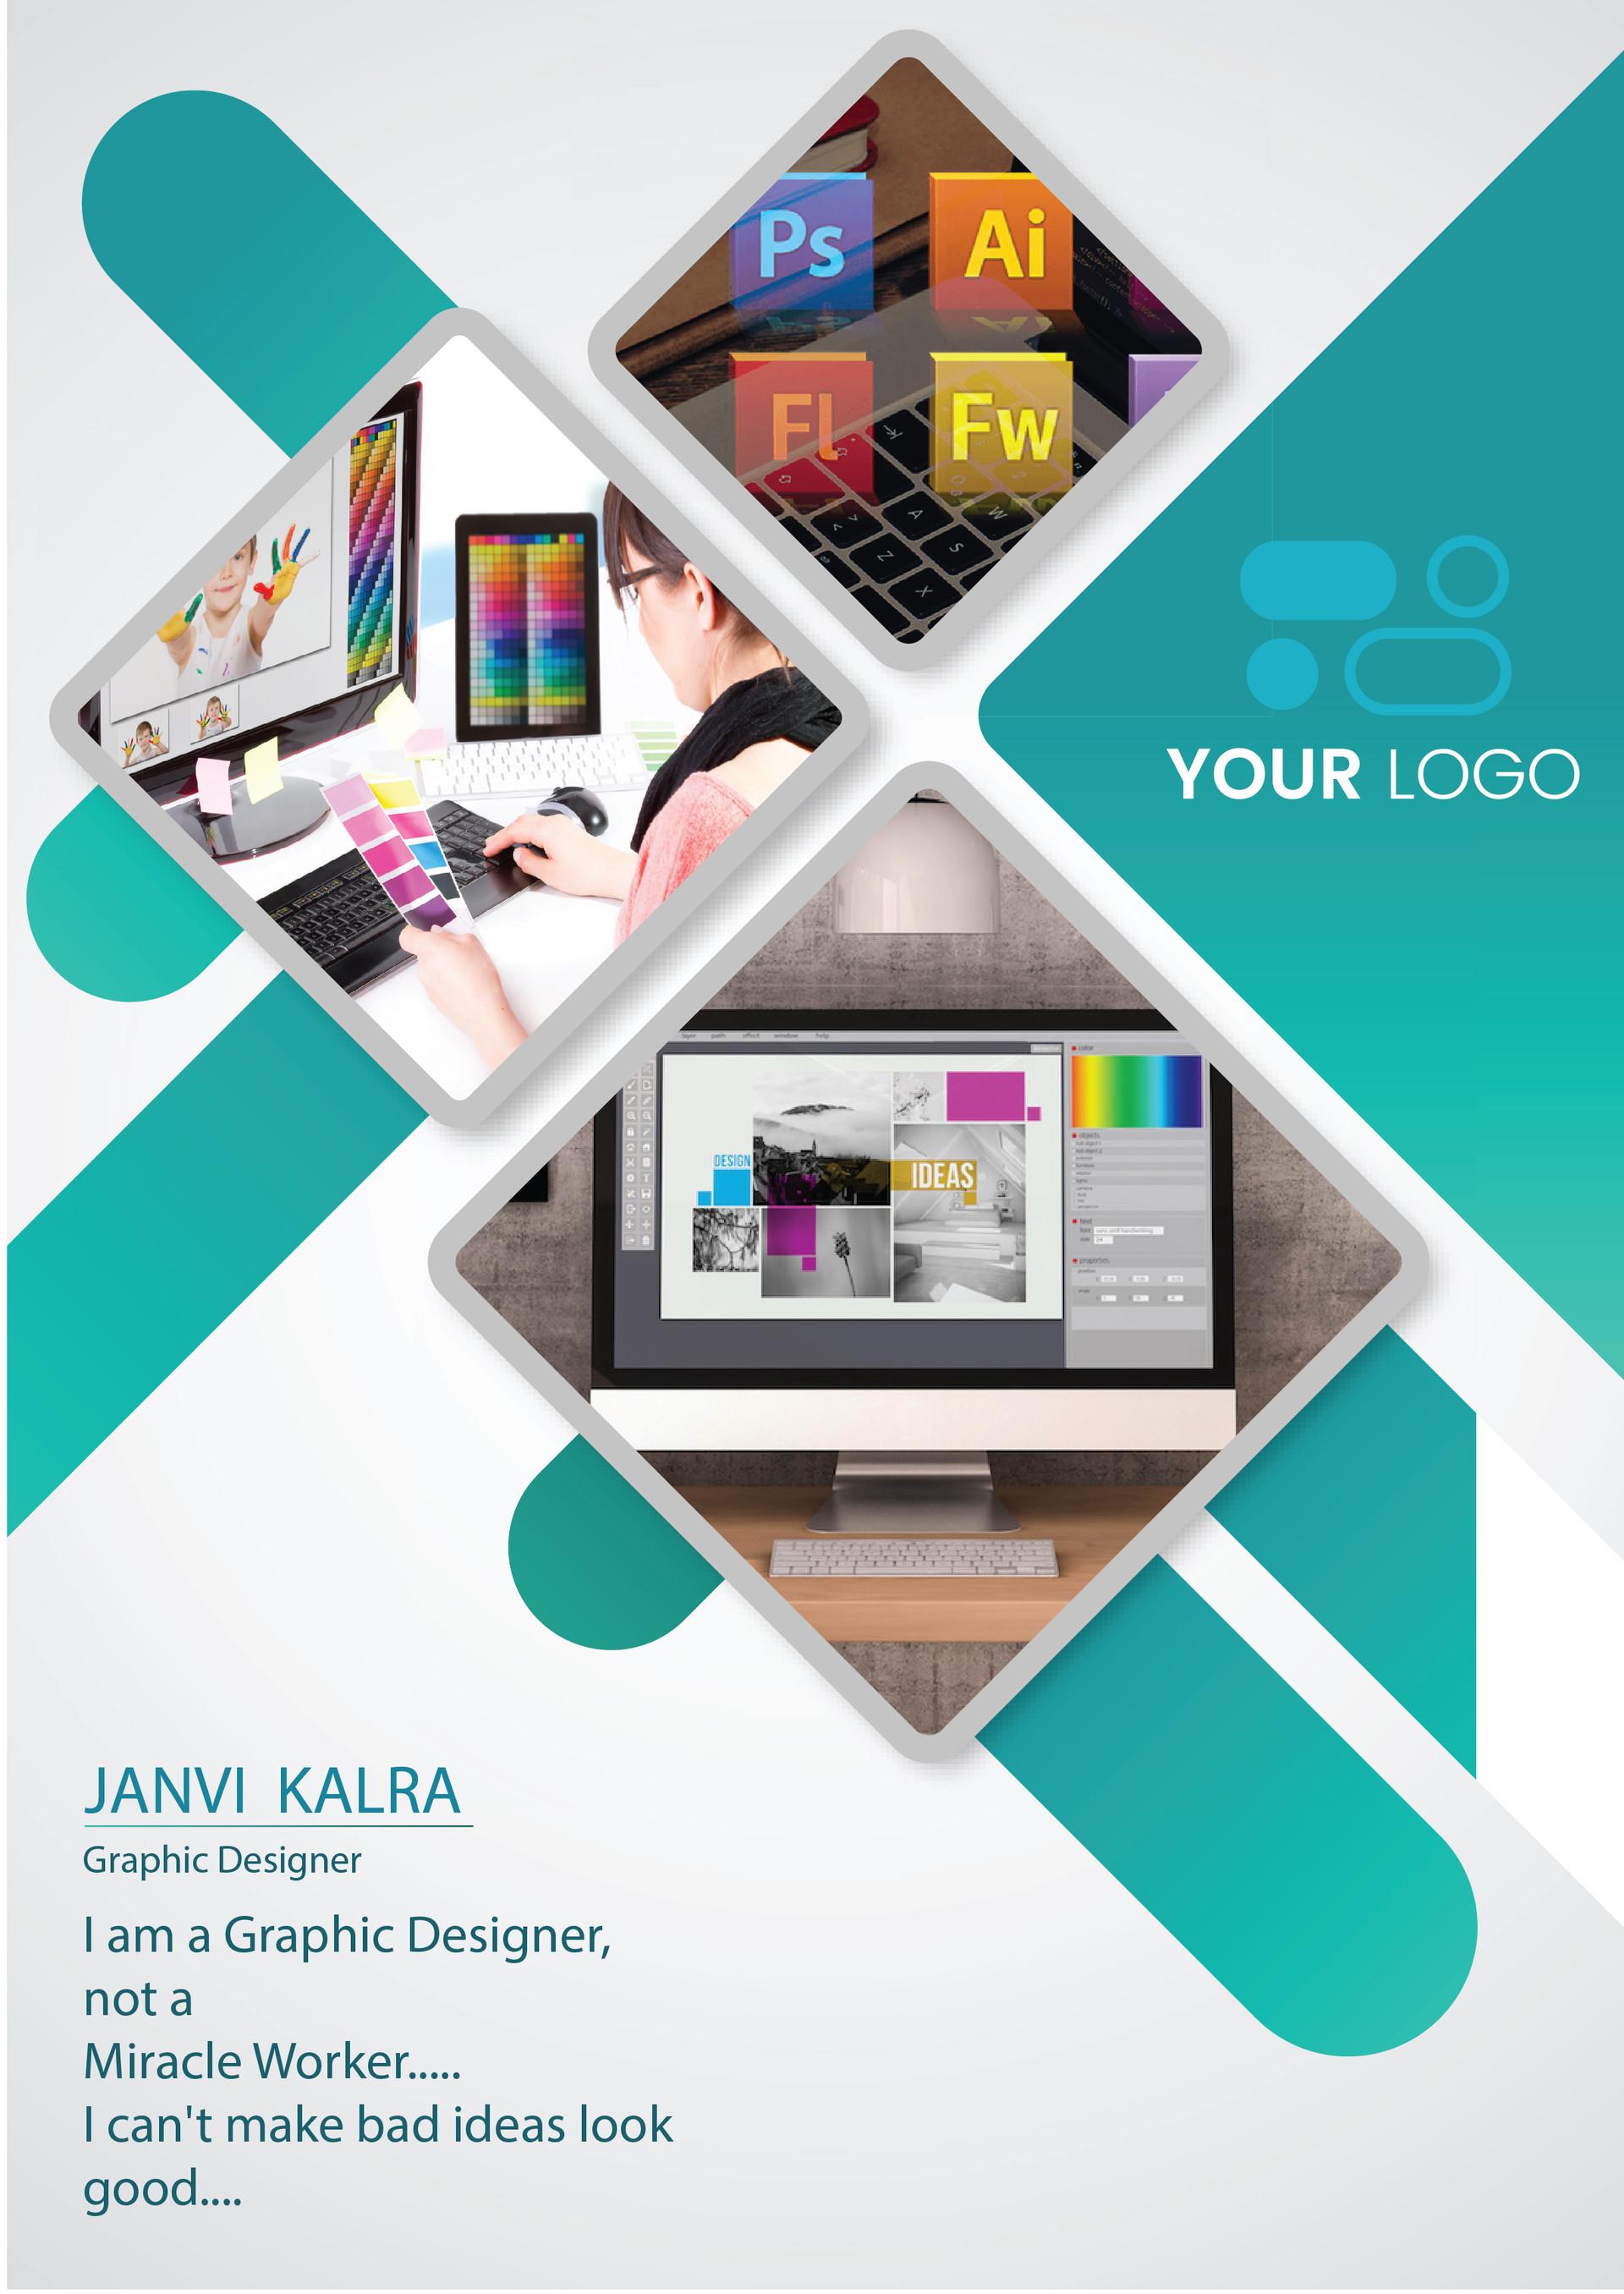 janvi kalra graphic designer poster